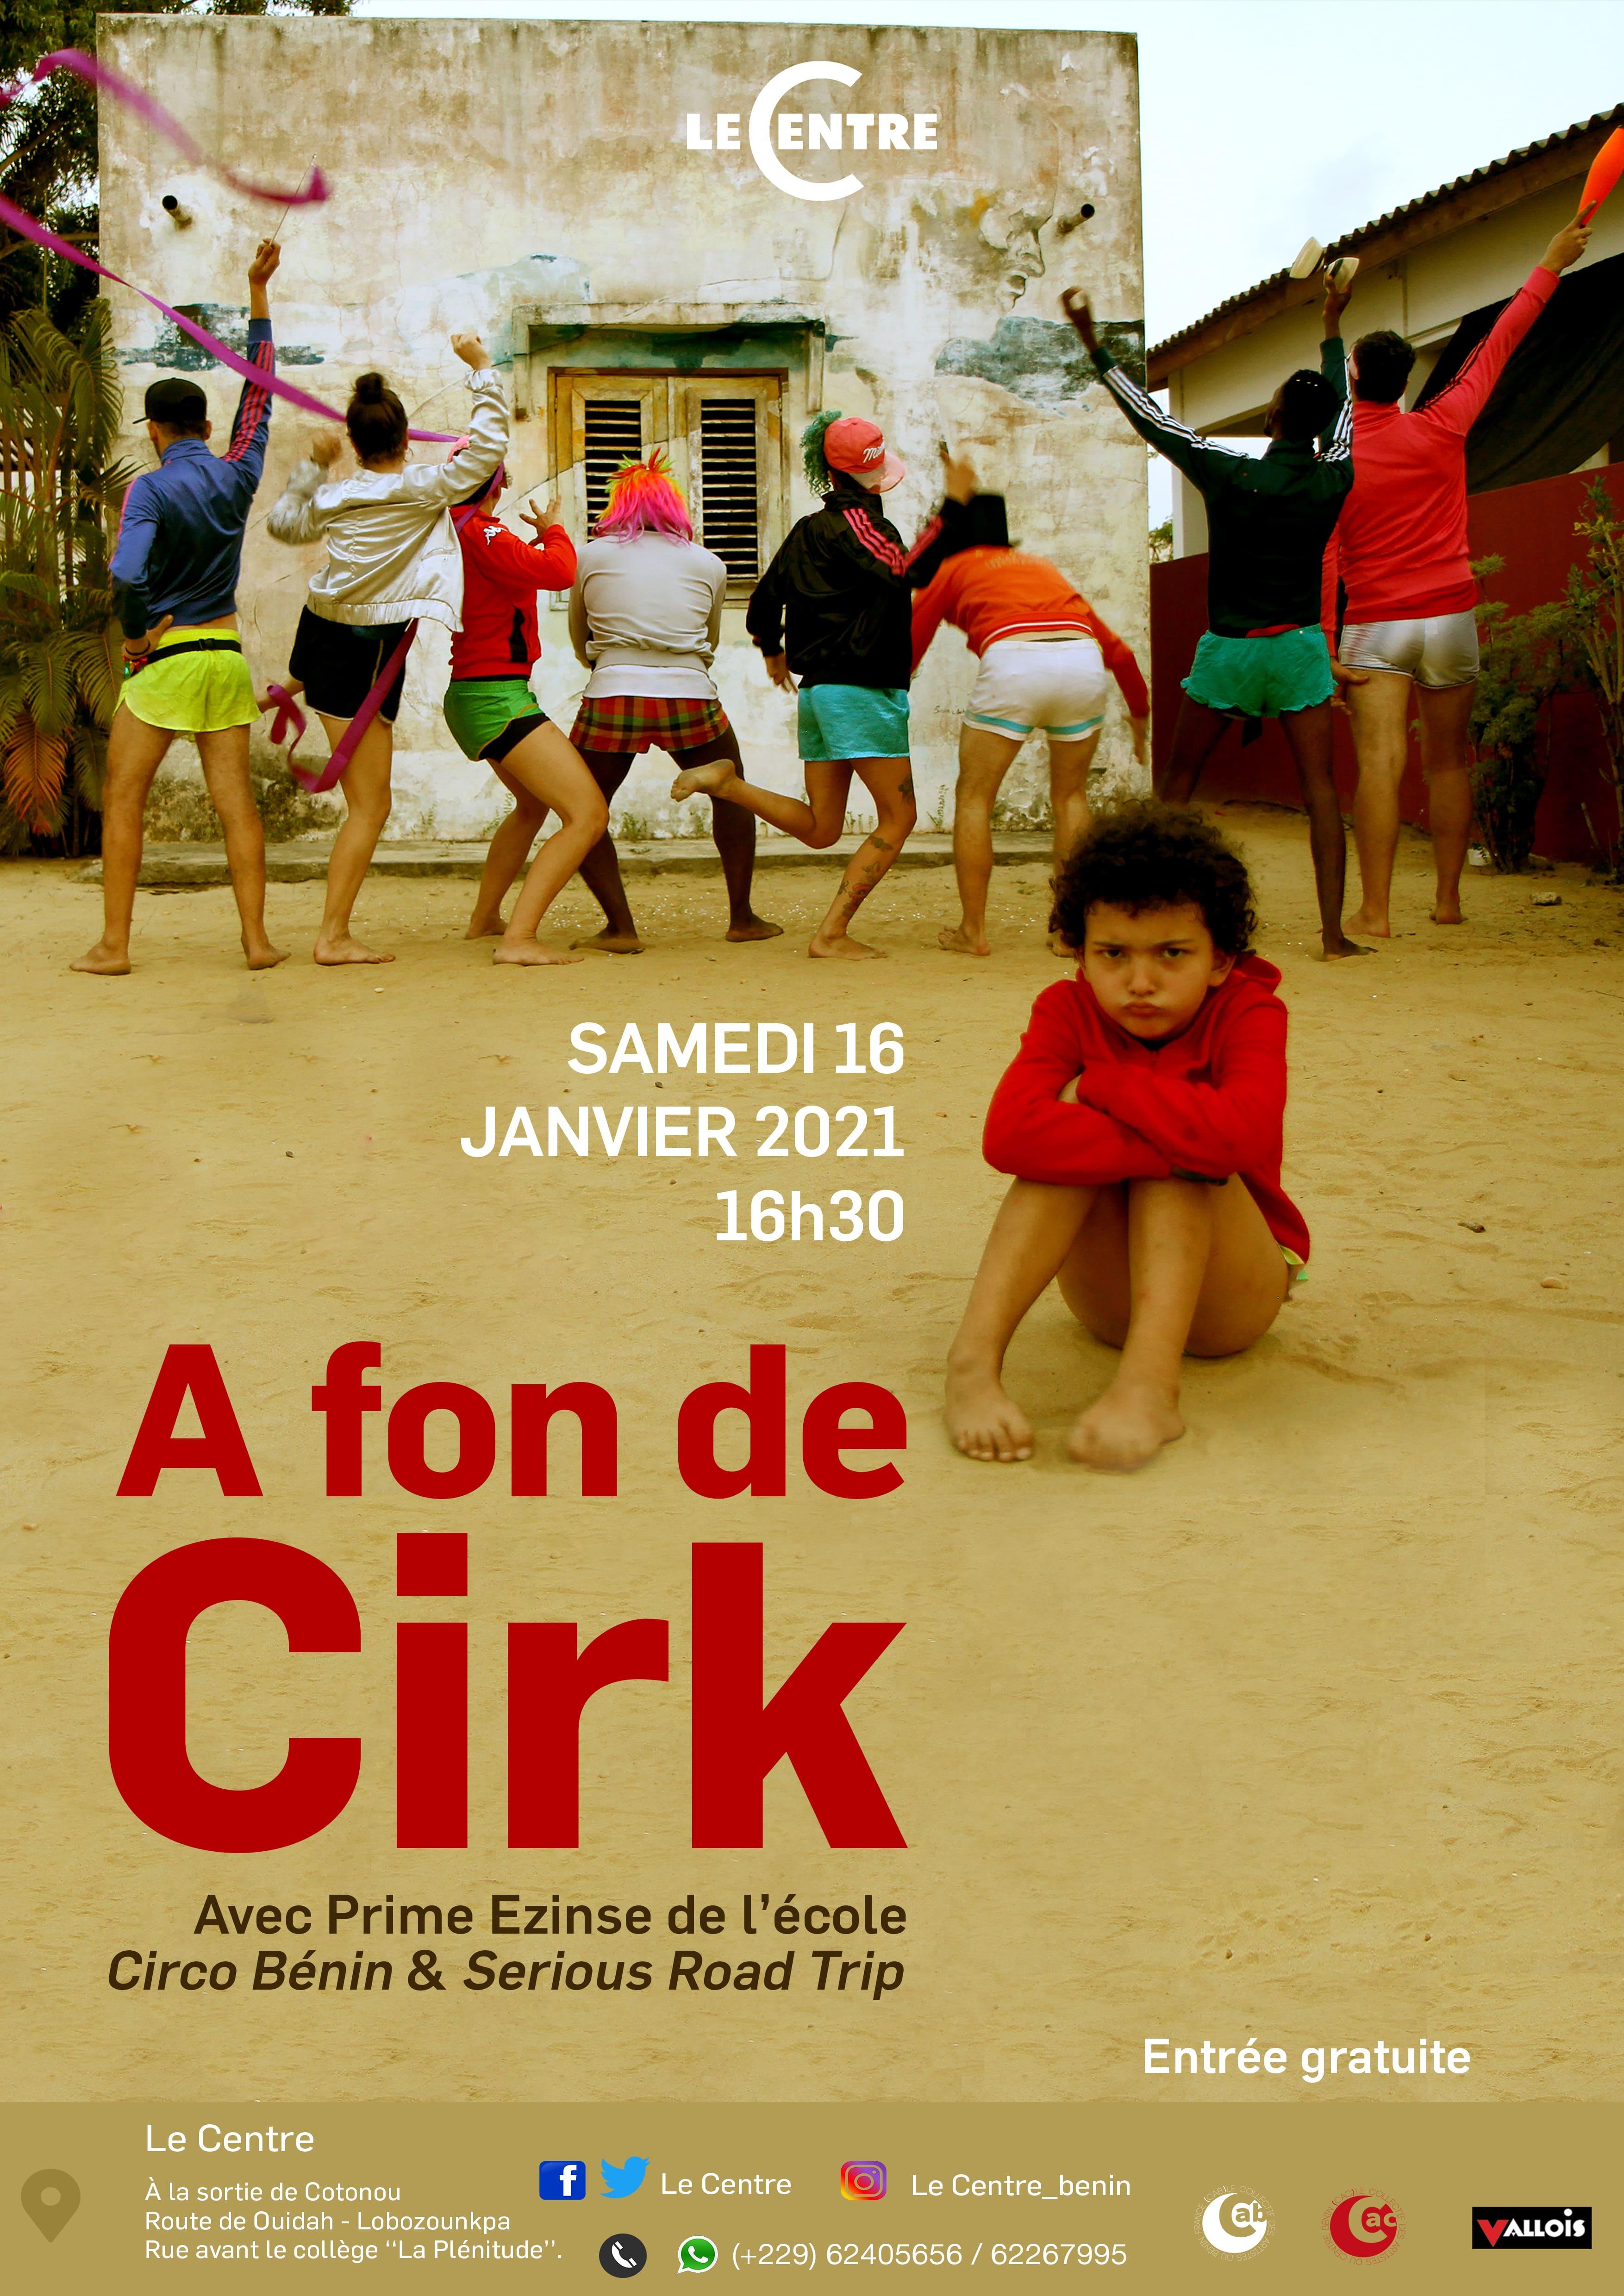 Cabaret A Fon de Cirk